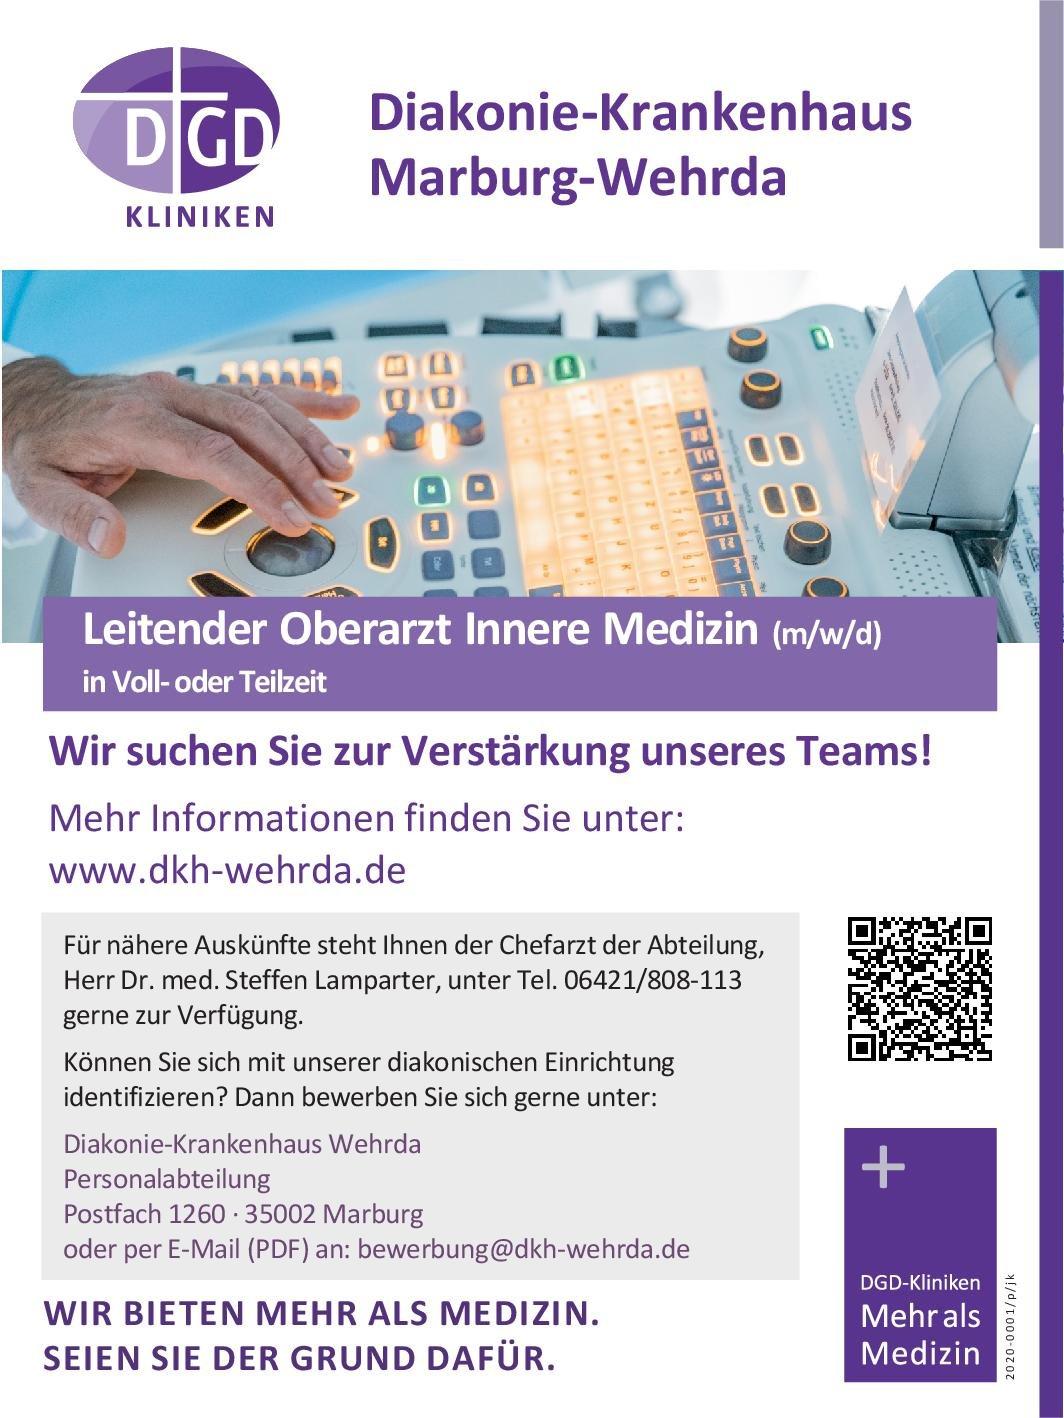 Diakonie-Krankenhaus Wehrda Leitender Oberarzt Innere Medizin (m/w/d)  Innere Medizin, Innere Medizin Oberarzt